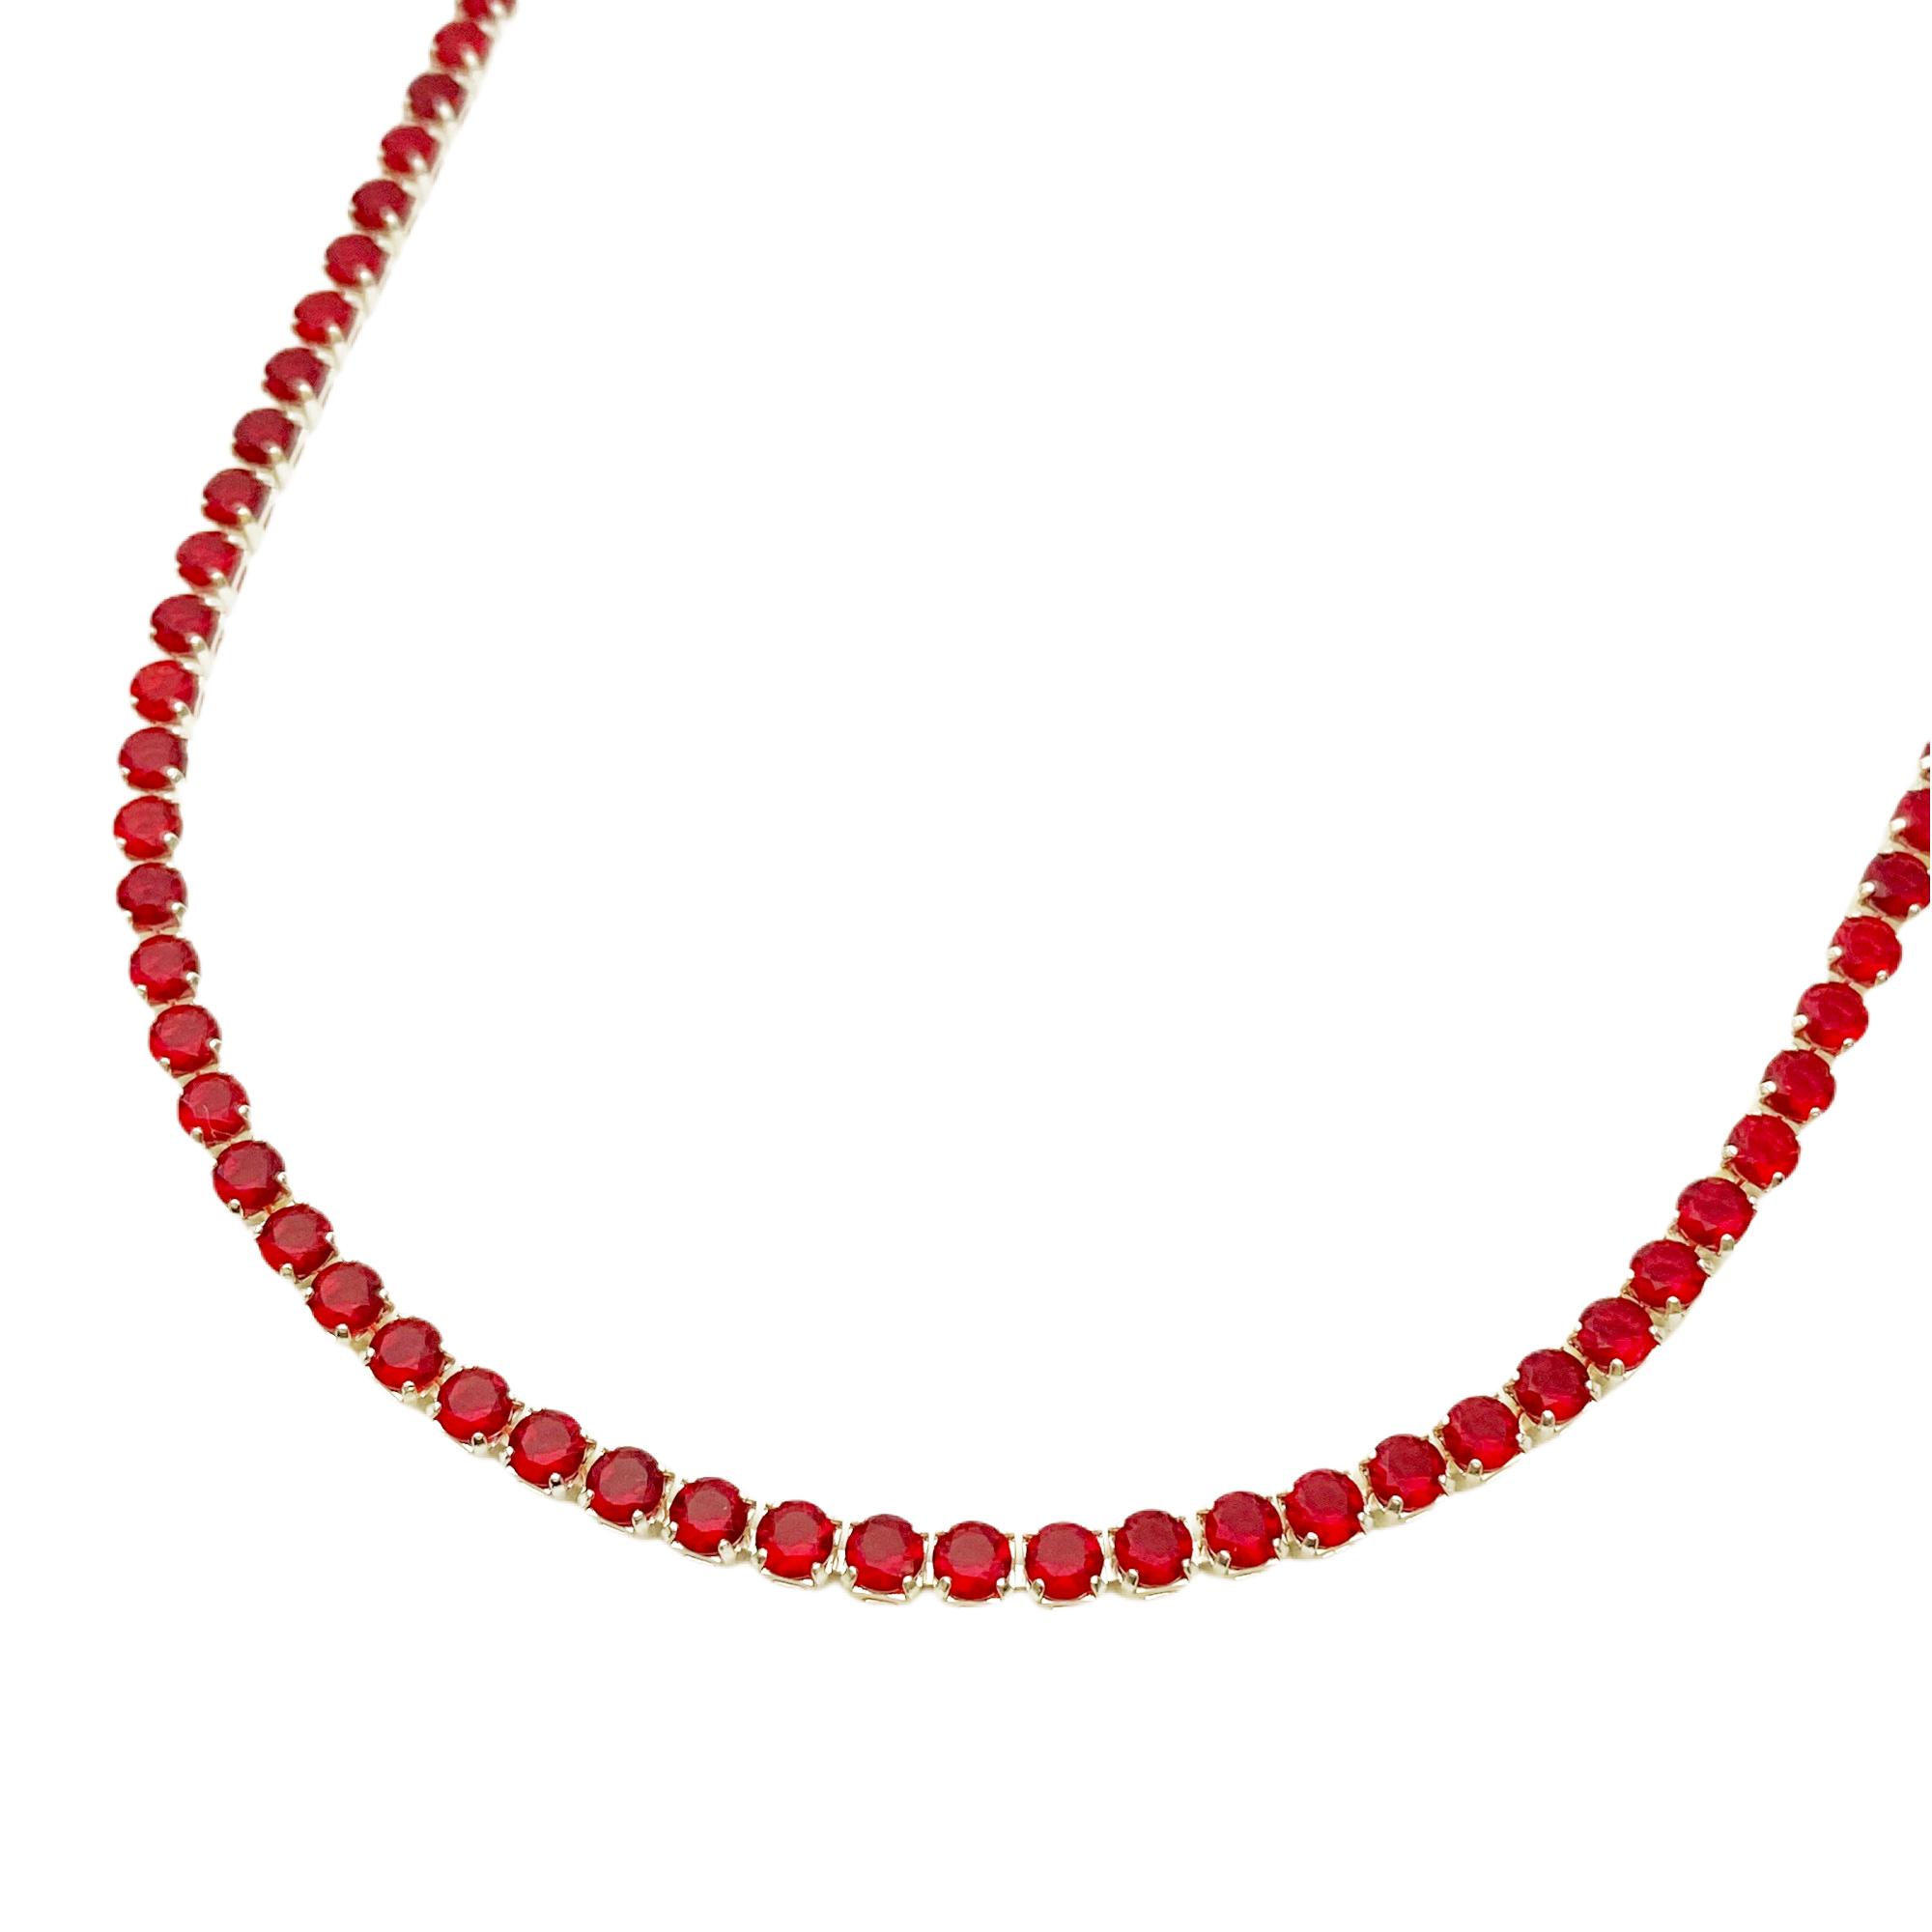 Colar Riviera Tennis Chain 3mm 45cm (9,7g) (Pedra Zircônia Vermelha) (Banho Prata 925)